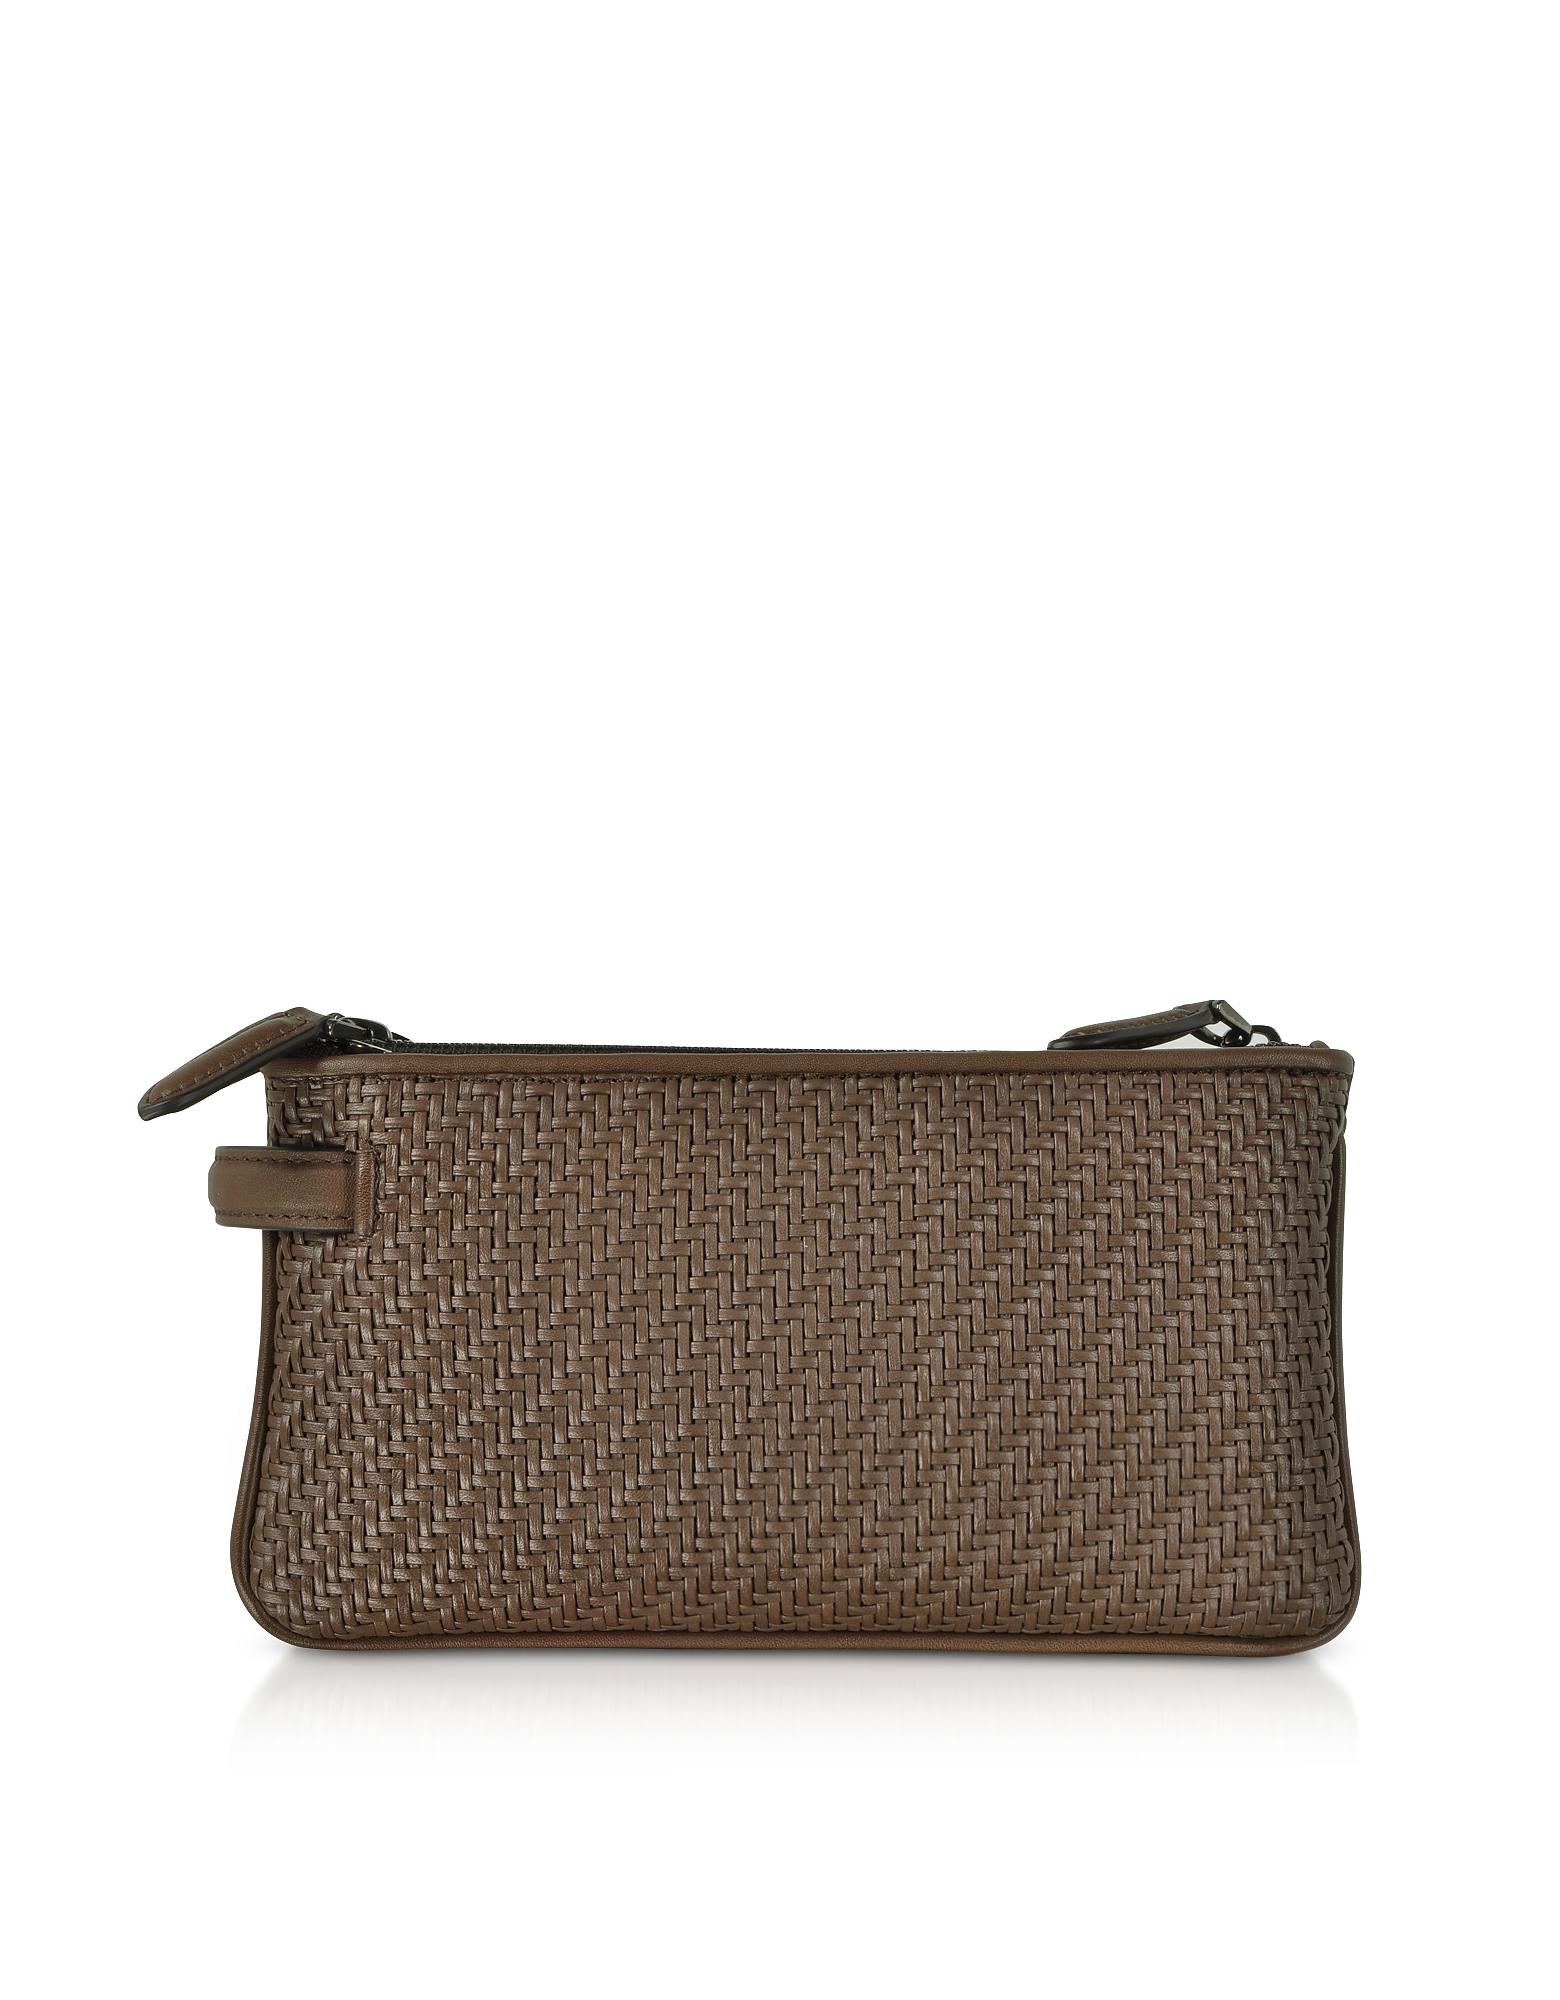 Ermenegildo Zegna Men's Bags, Pelle Tessuta Woven Leather Pouch